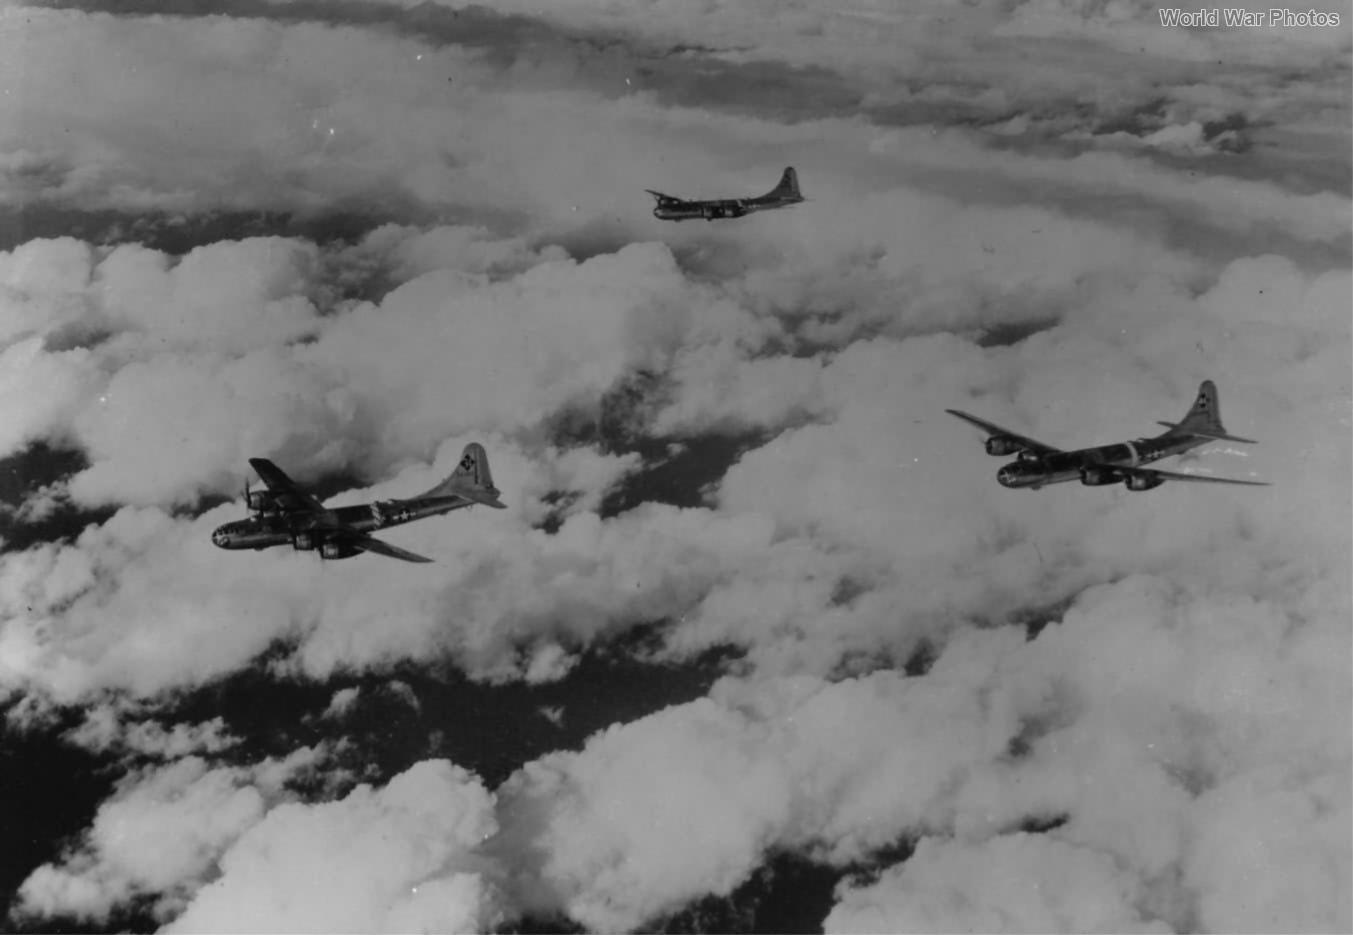 B-29 of the 444th BG over Hump 21 November 1944